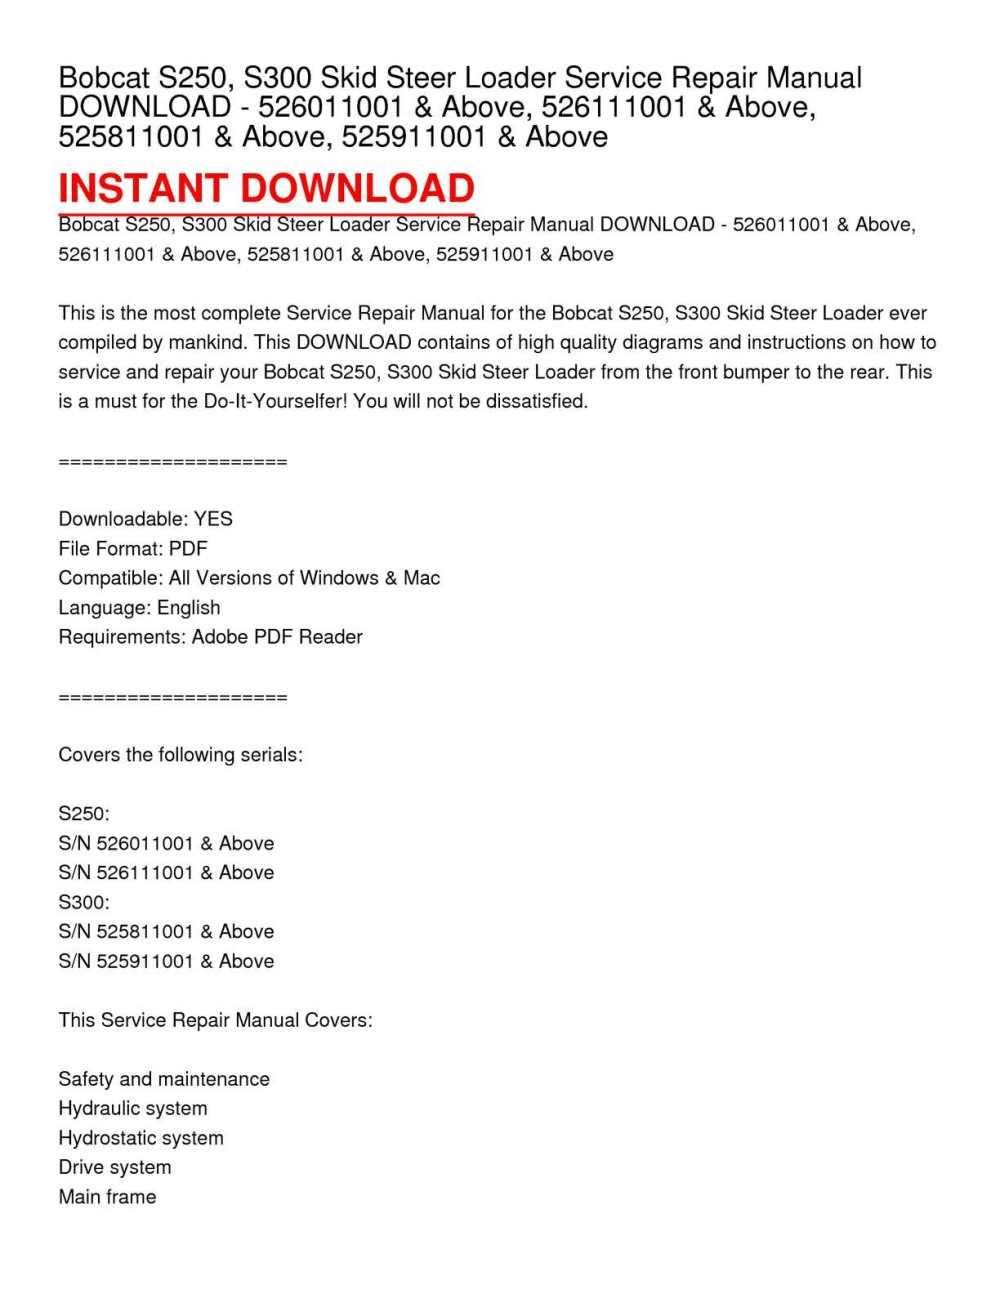 medium resolution of bobcat s250 s300 skid steer loader service repair manual download 526011001 above 526111001 above 525811001 above 525911001 above